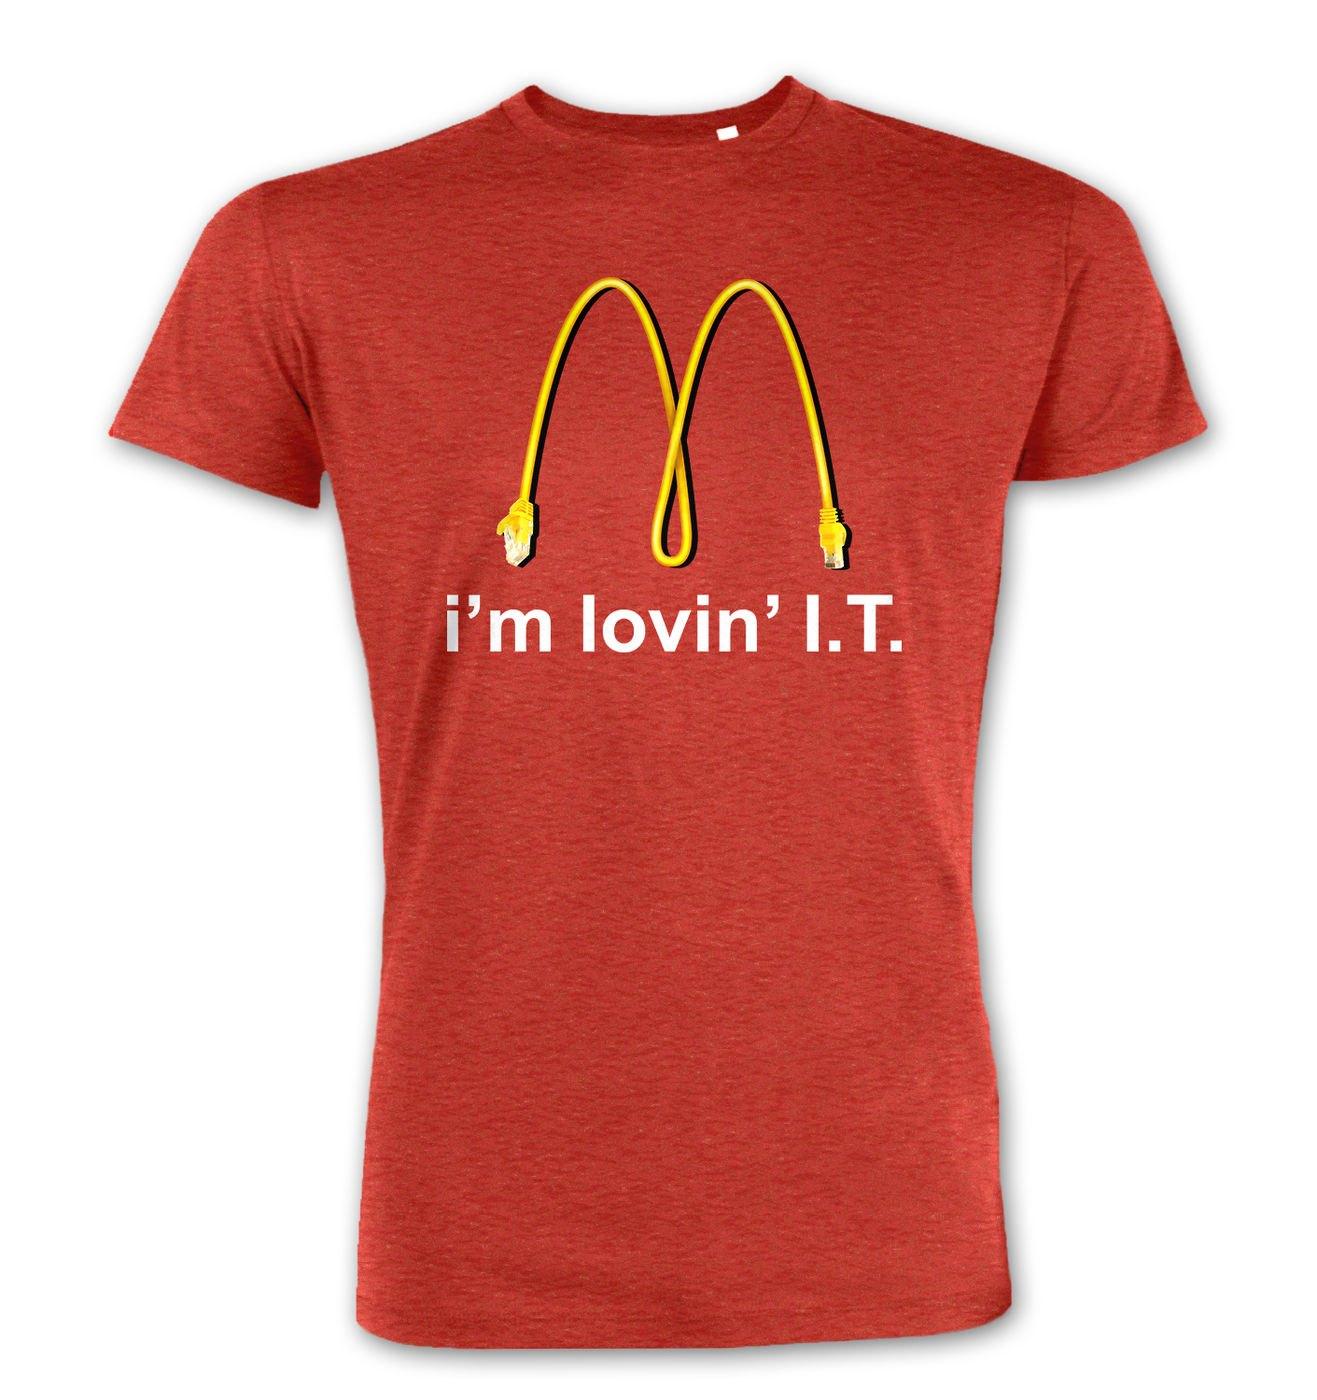 I'm Lovin' I.T. premium t-shirt by Something Geeky